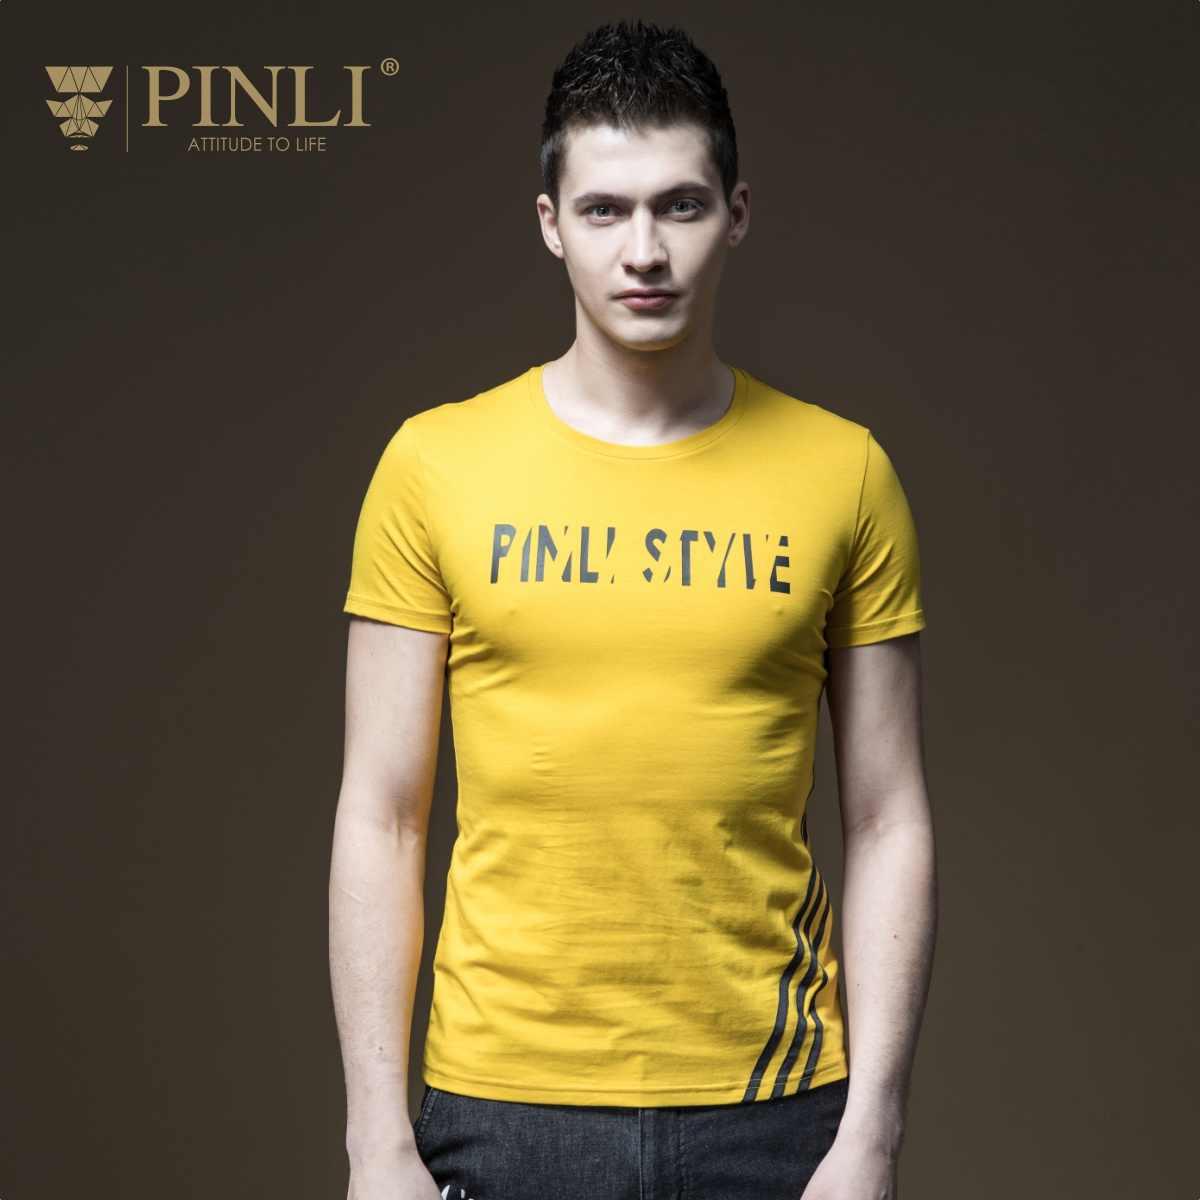 Undertale Dragon Ball Linkin Park Pinli Pin летняя новая мужская футболка с принтом, с тонким вырезом, с коротким рукавом B182211484